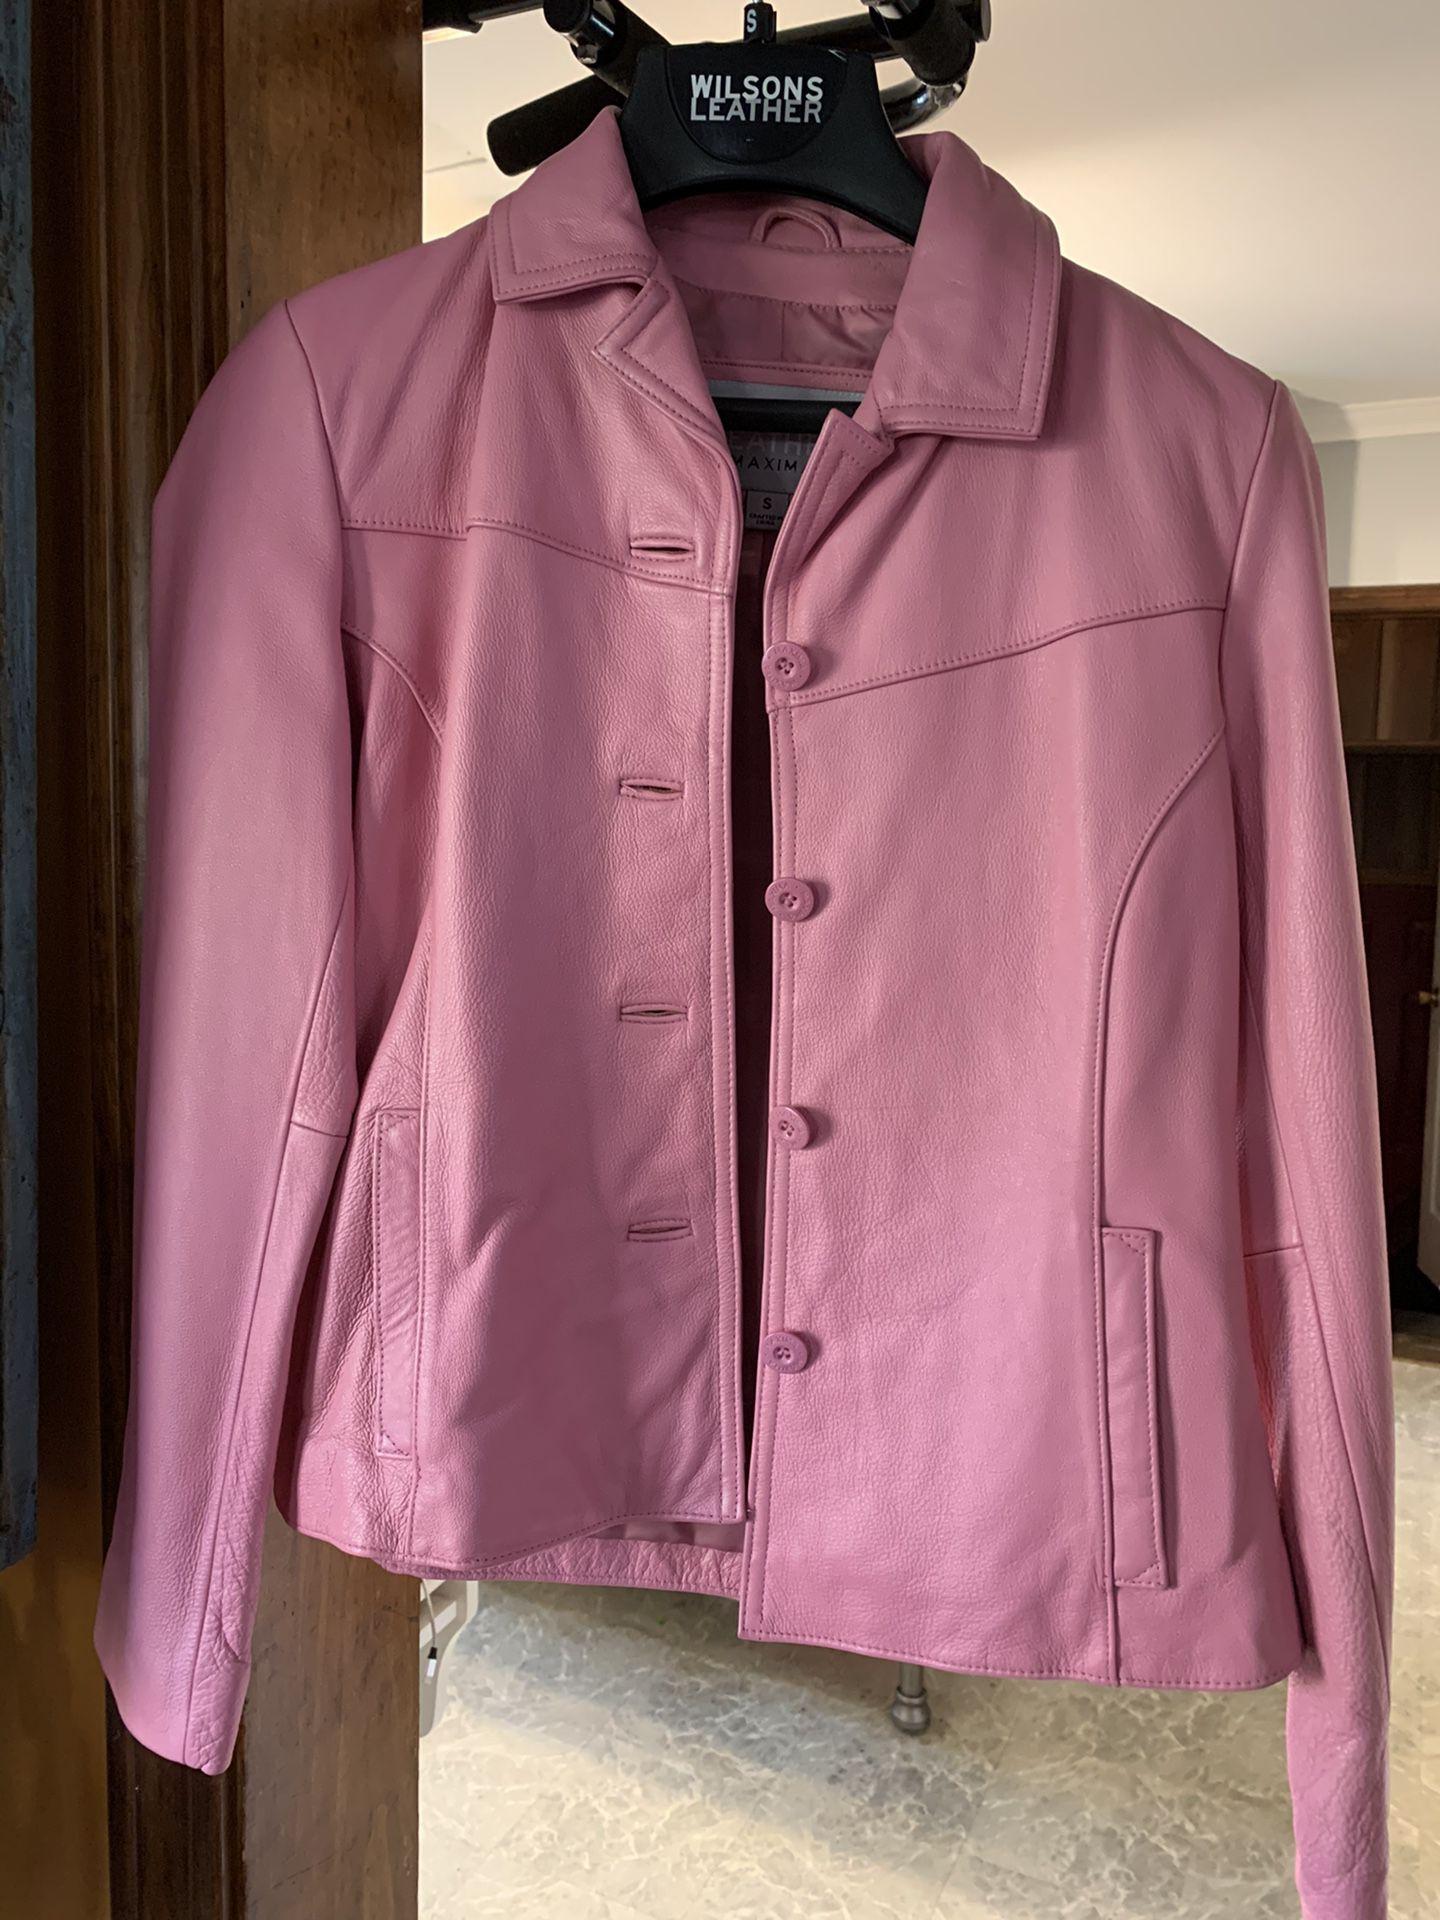 Women's Wilson leather jacket